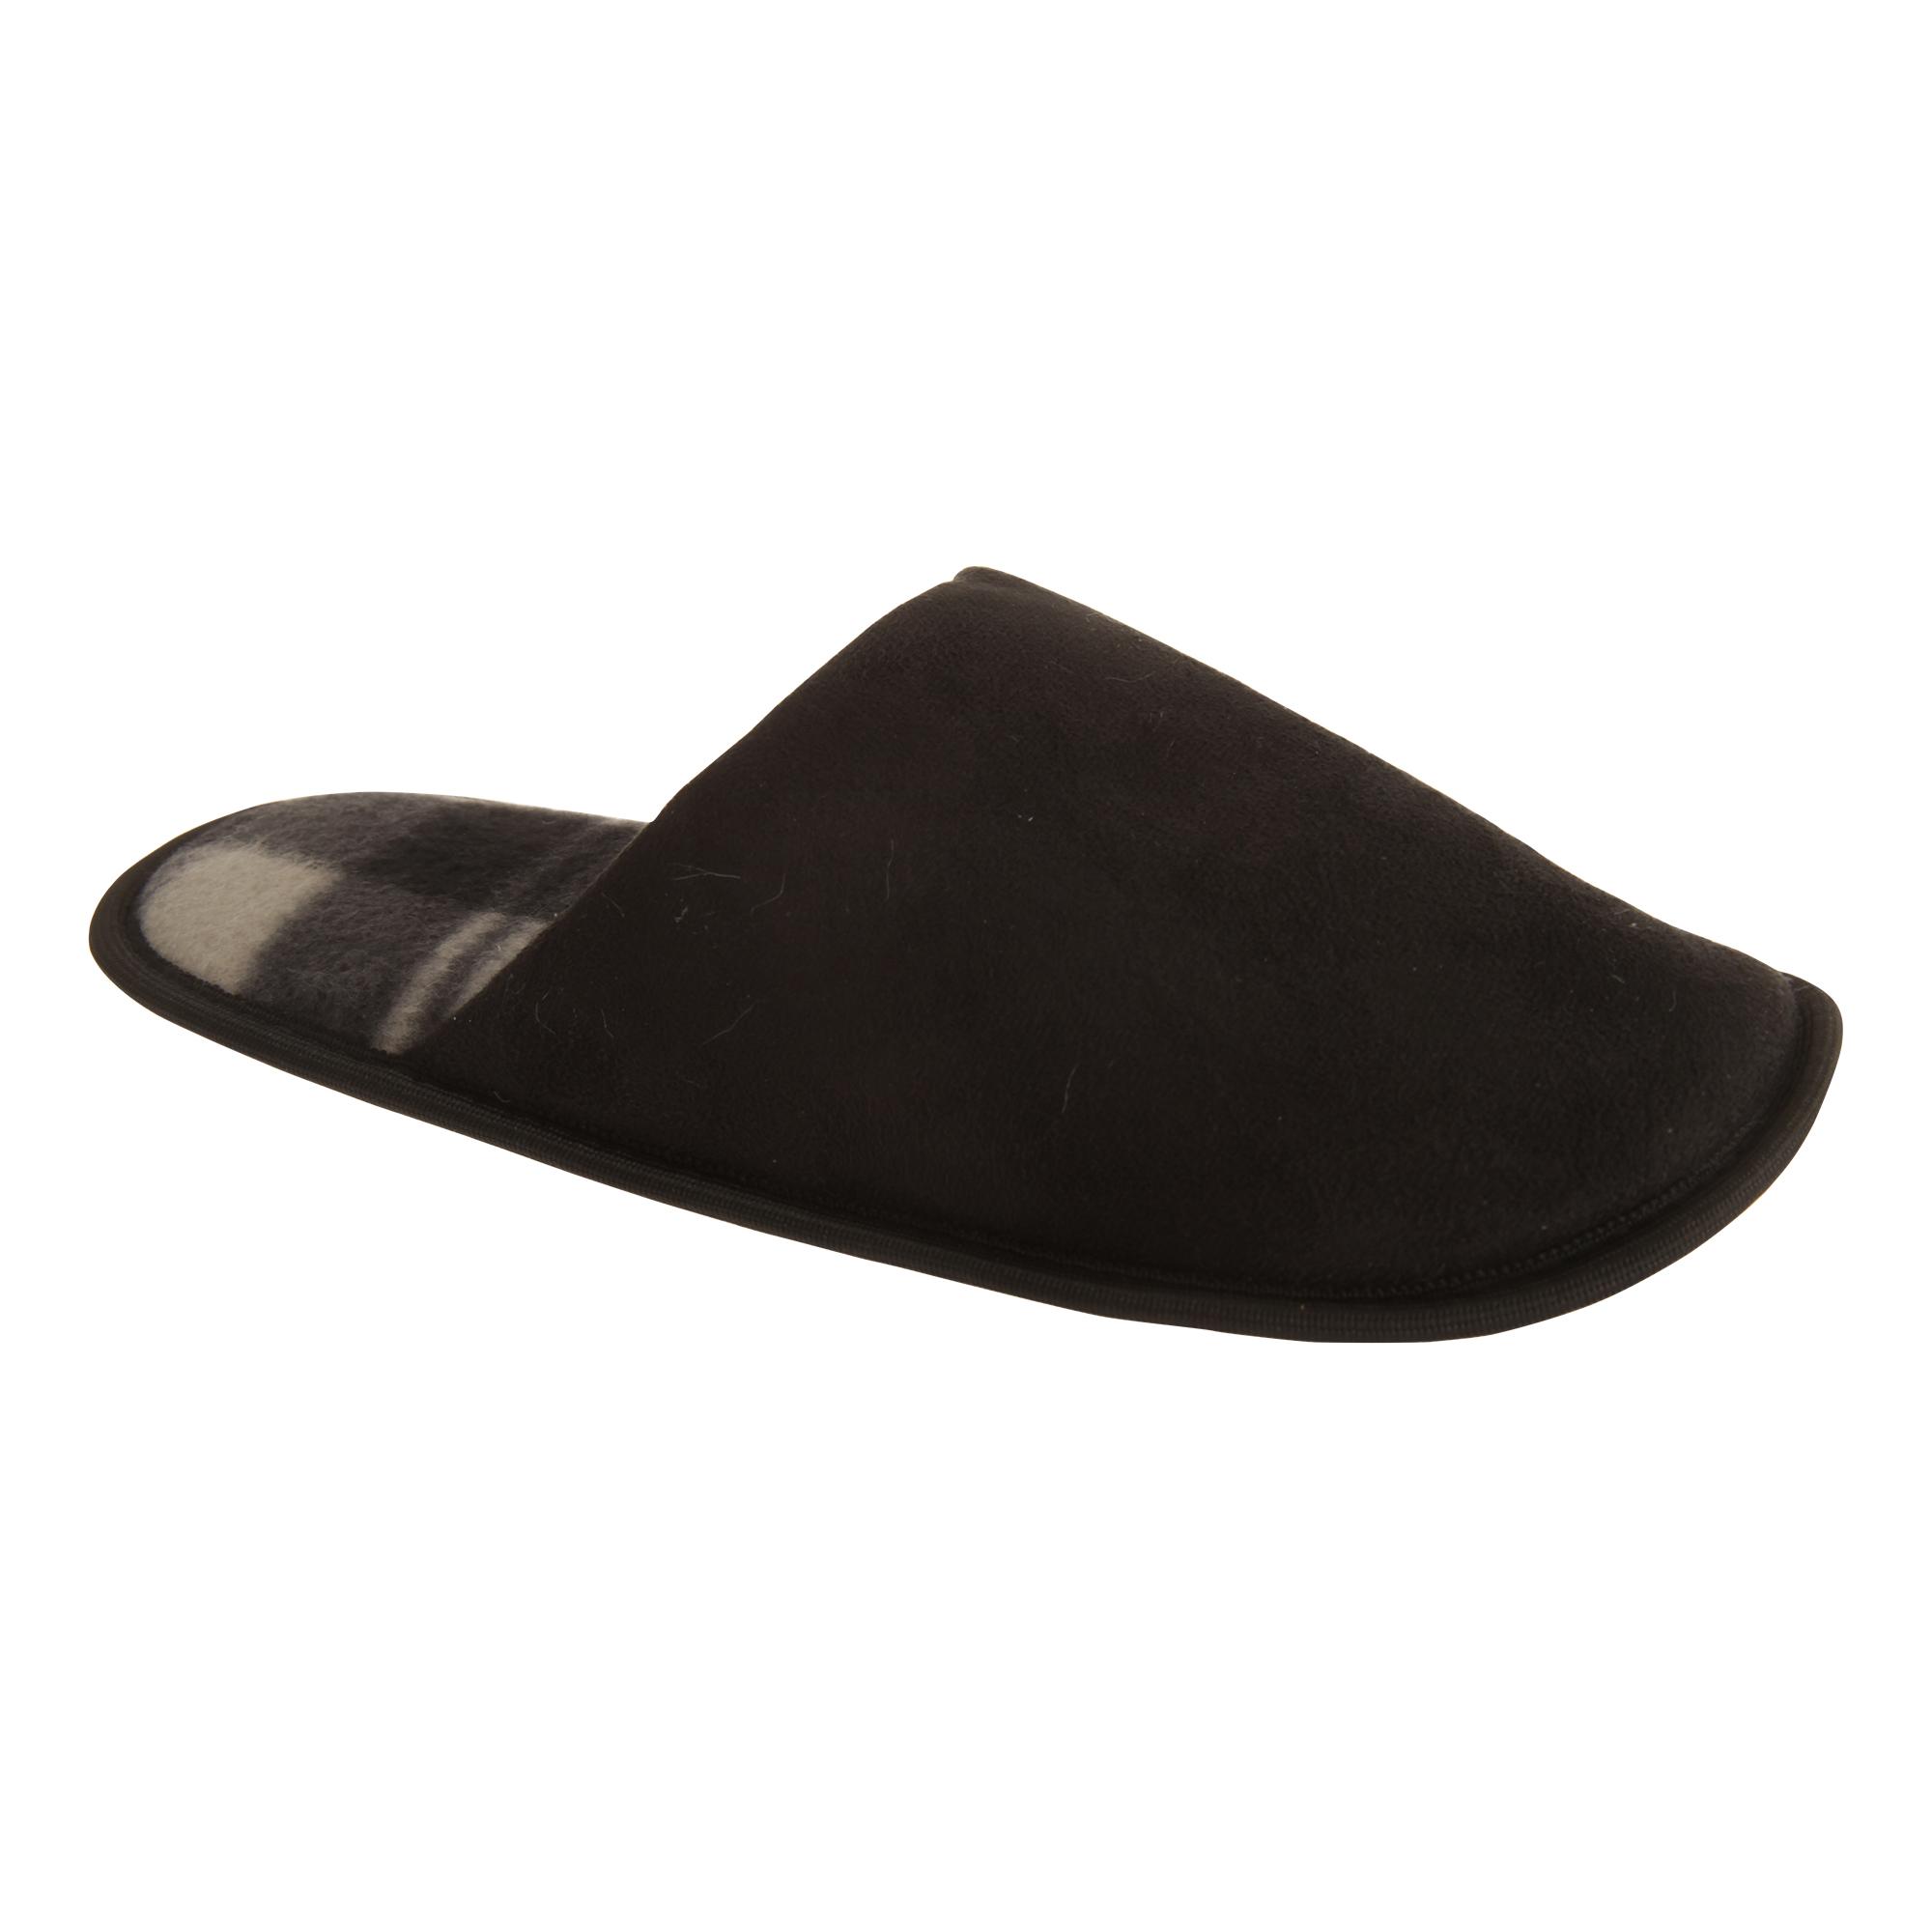 Cheque Para Hombre Forrado Zapatillas Slip-on